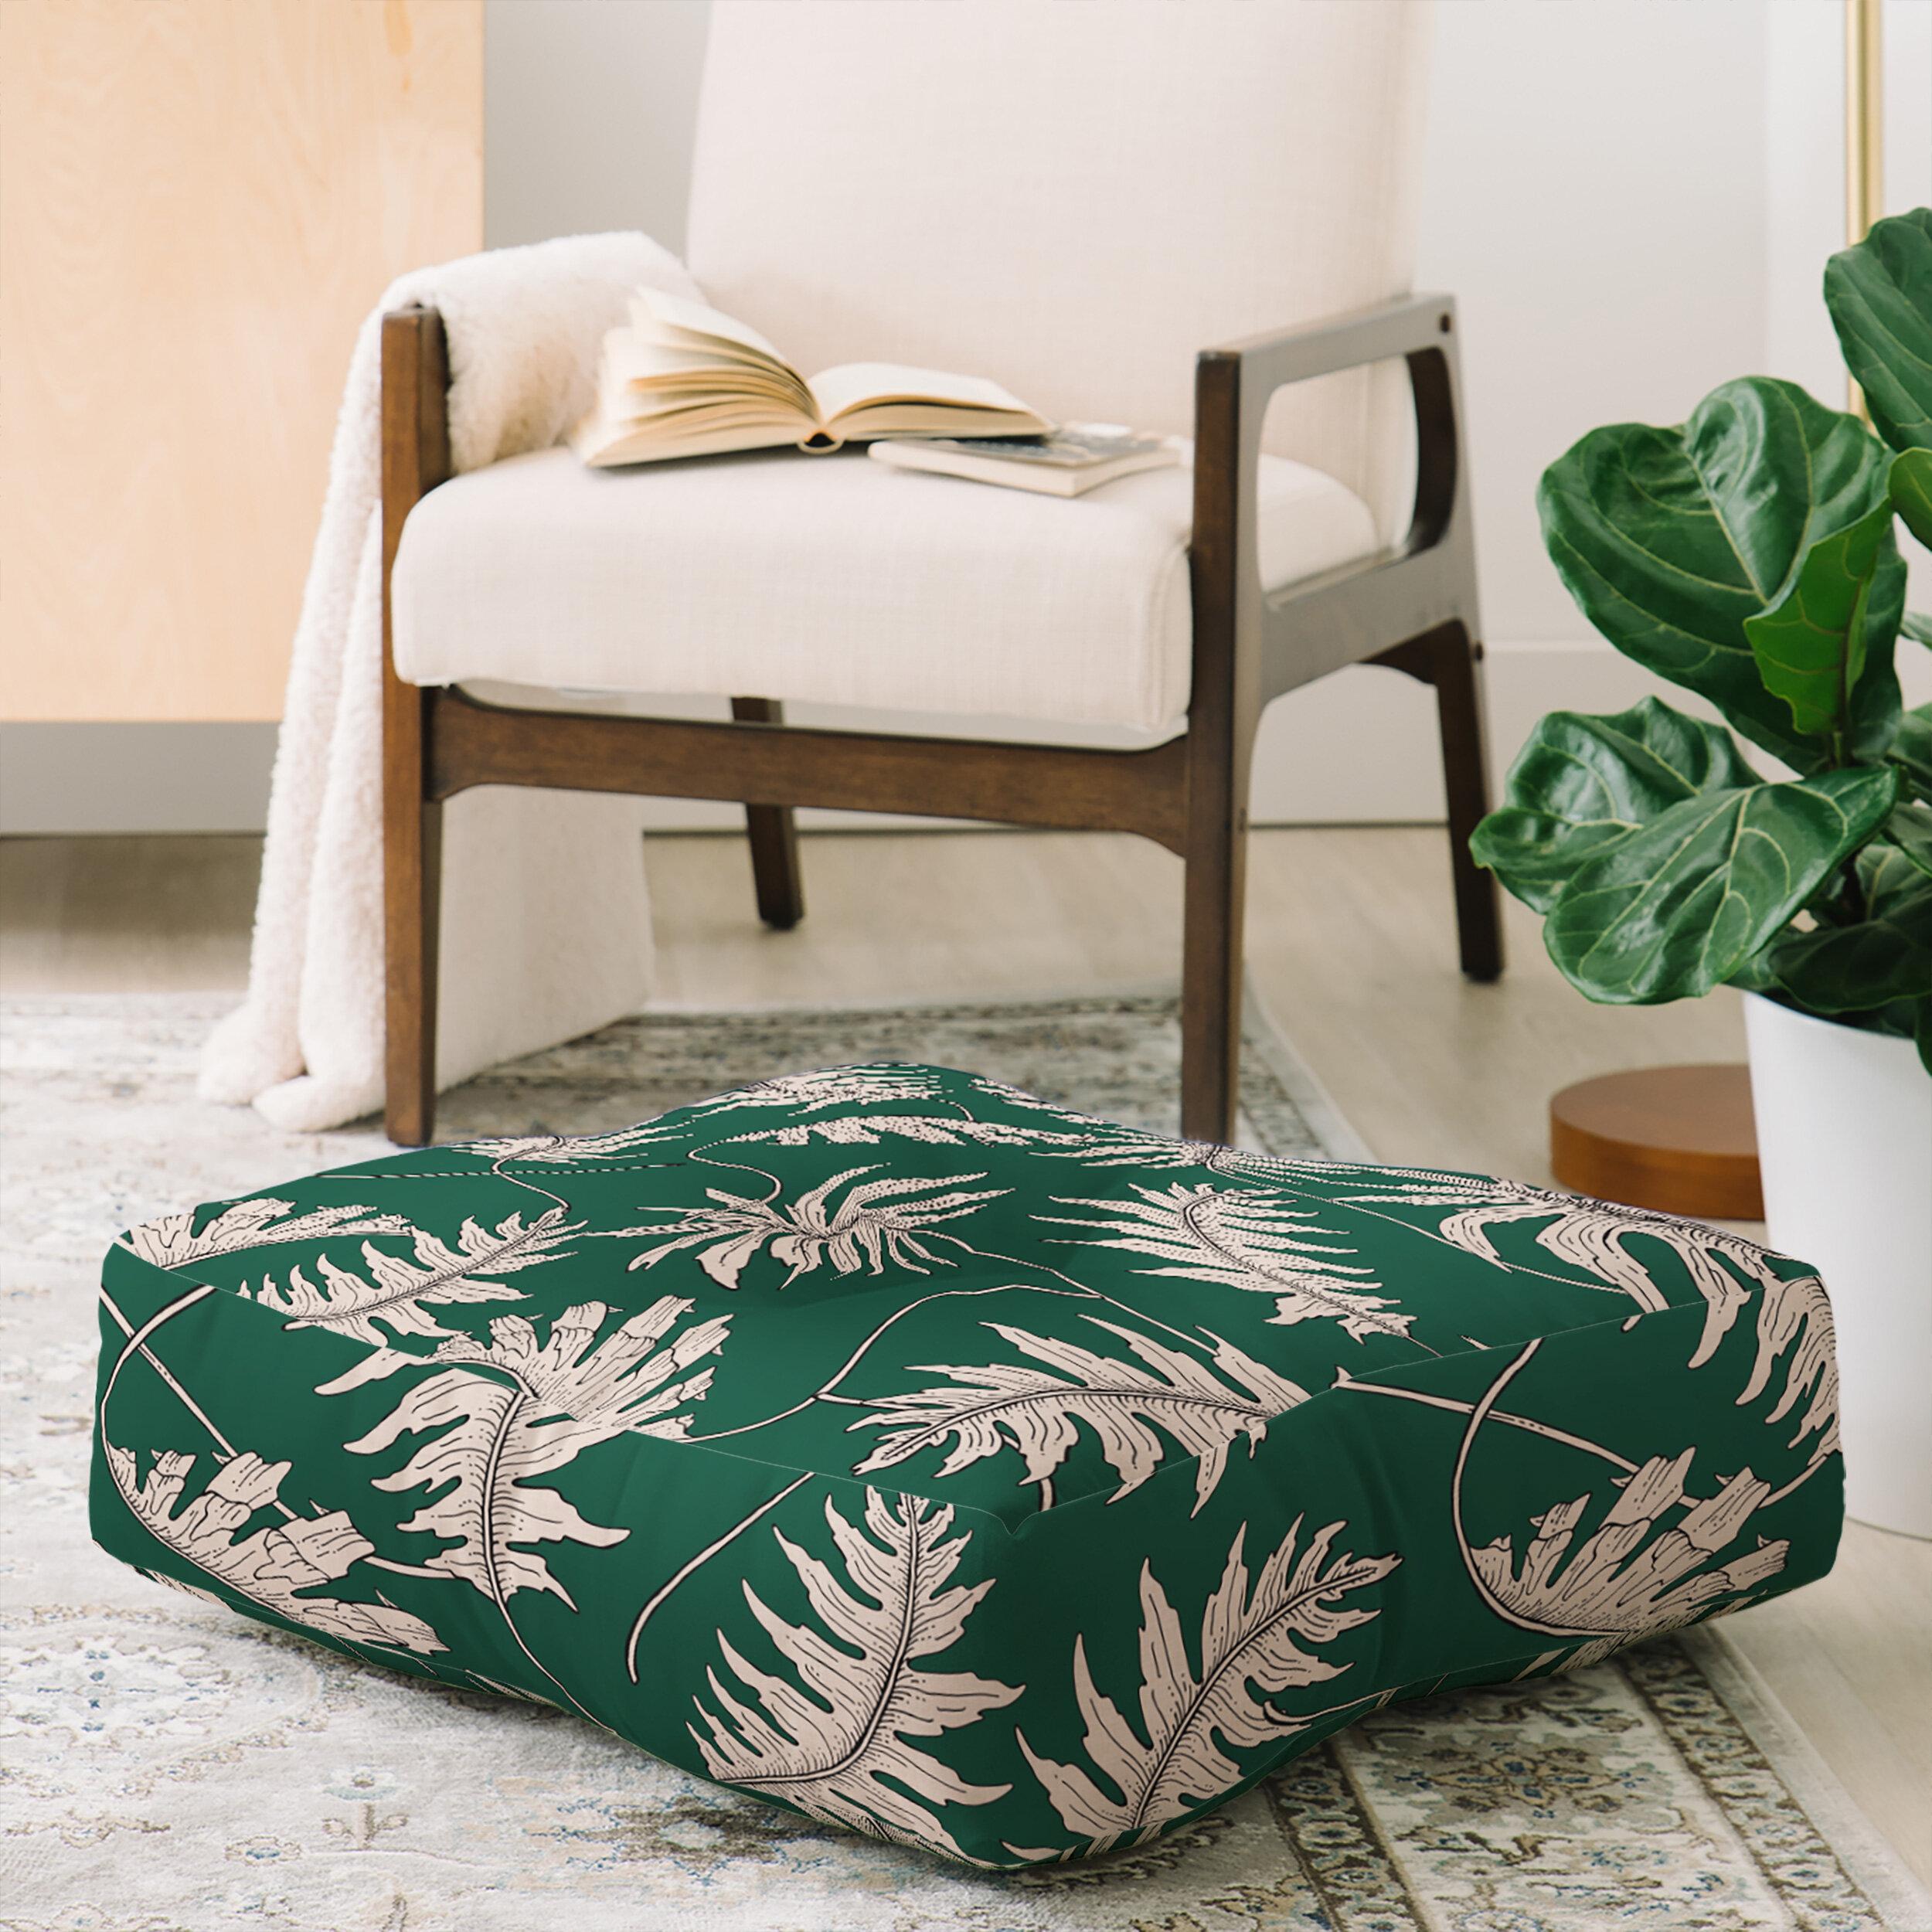 Floor Floral Throw Pillows You Ll Love In 2021 Wayfair